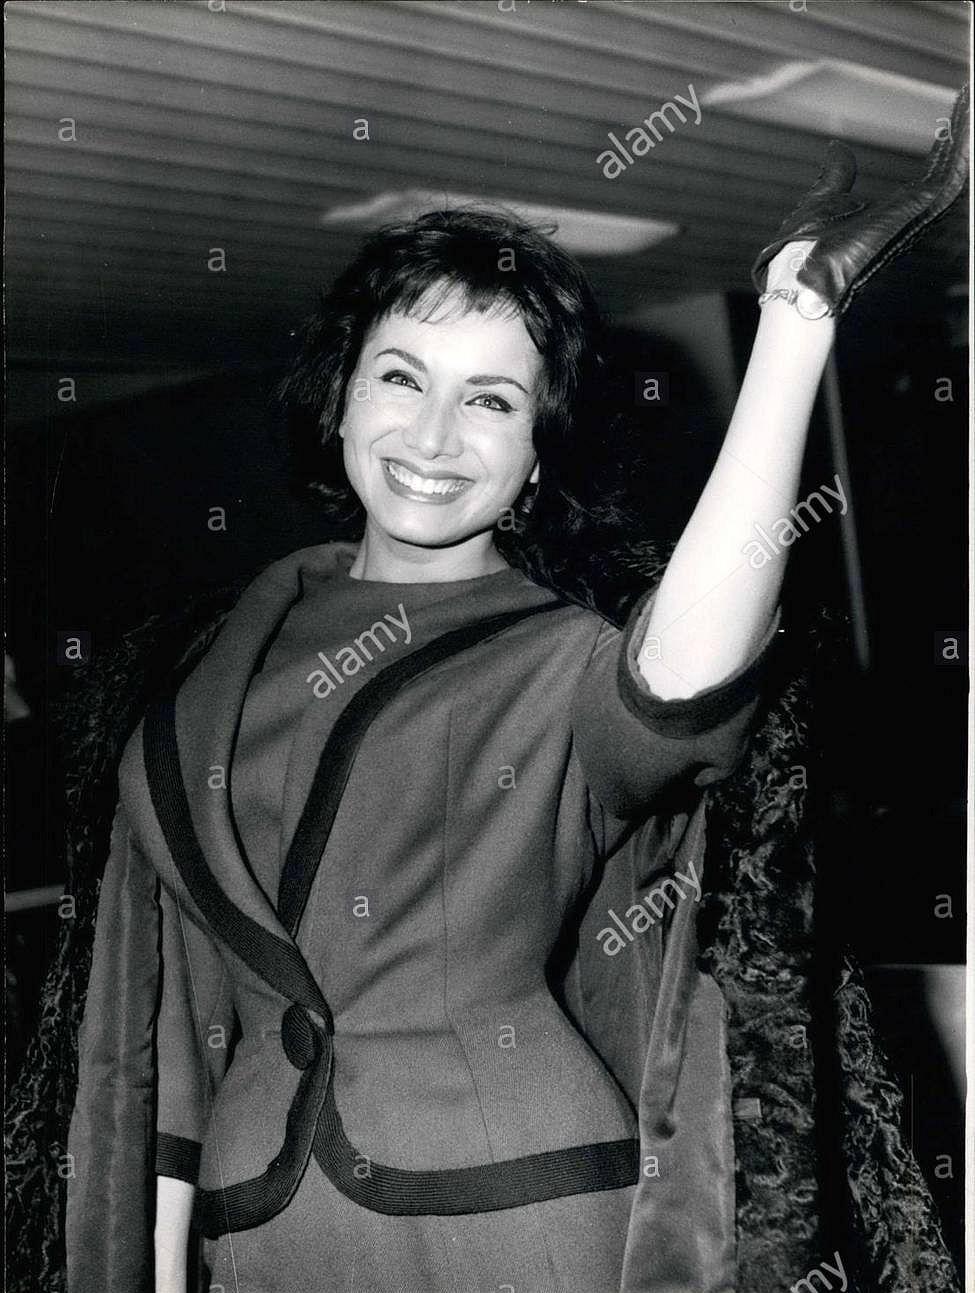 Gracia Bucella - Miss Italie 1962